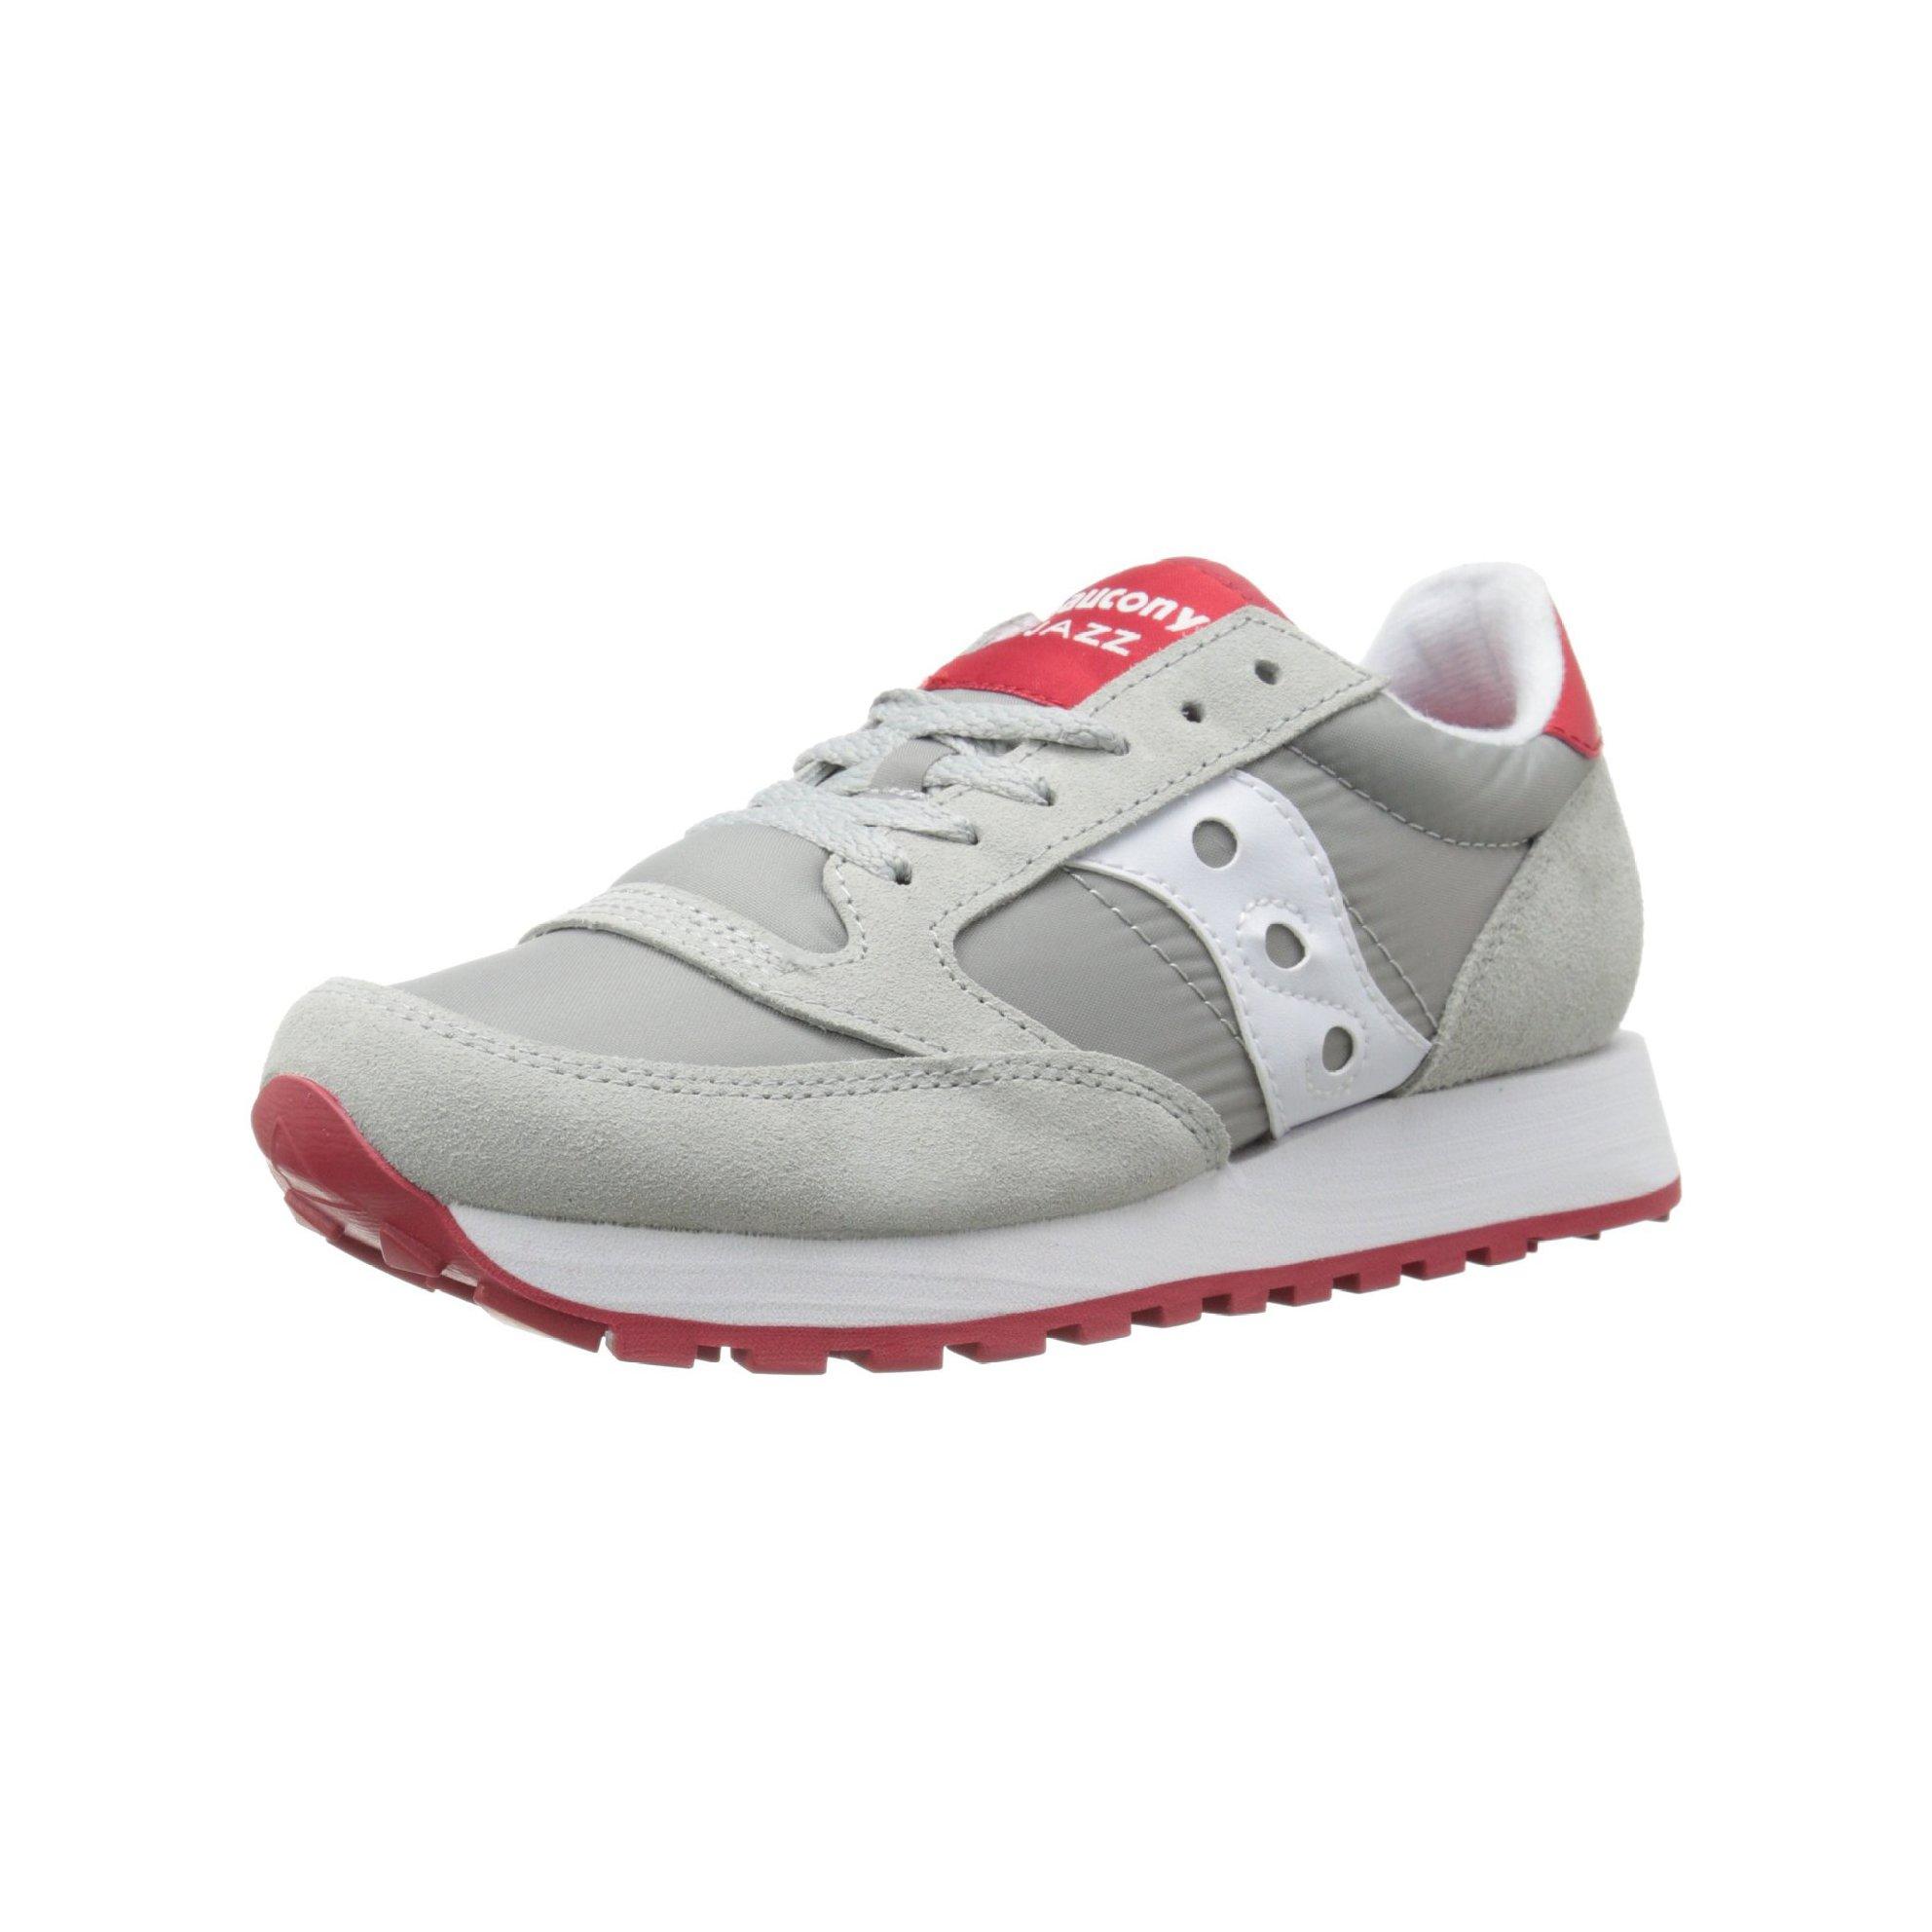 Saucony Originals Men's Jazz Original Retro Shoe, Grey/White/Red, 7 M US